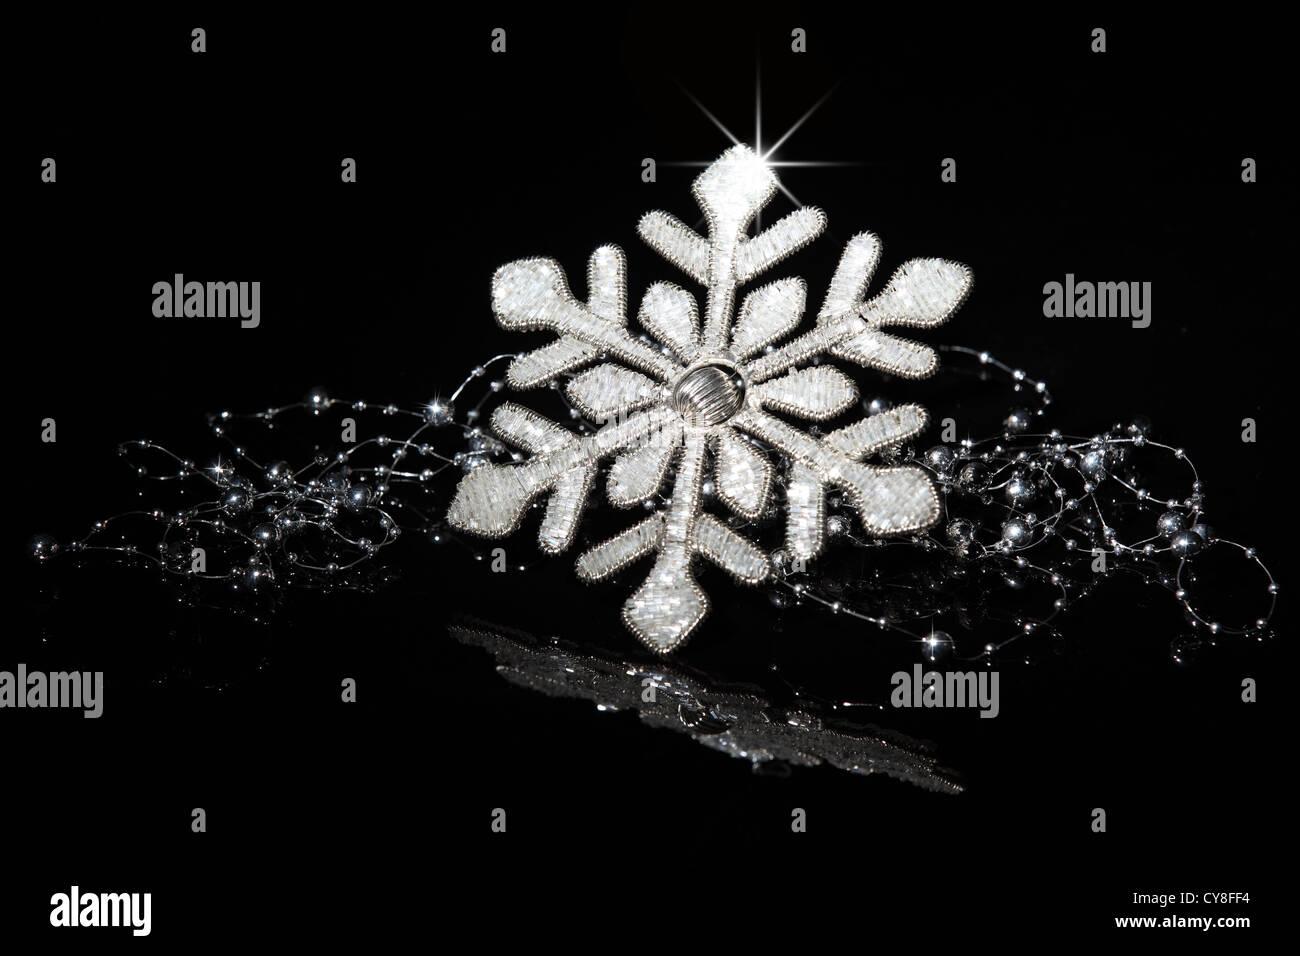 Glitter snowflake on black background. - Stock Image